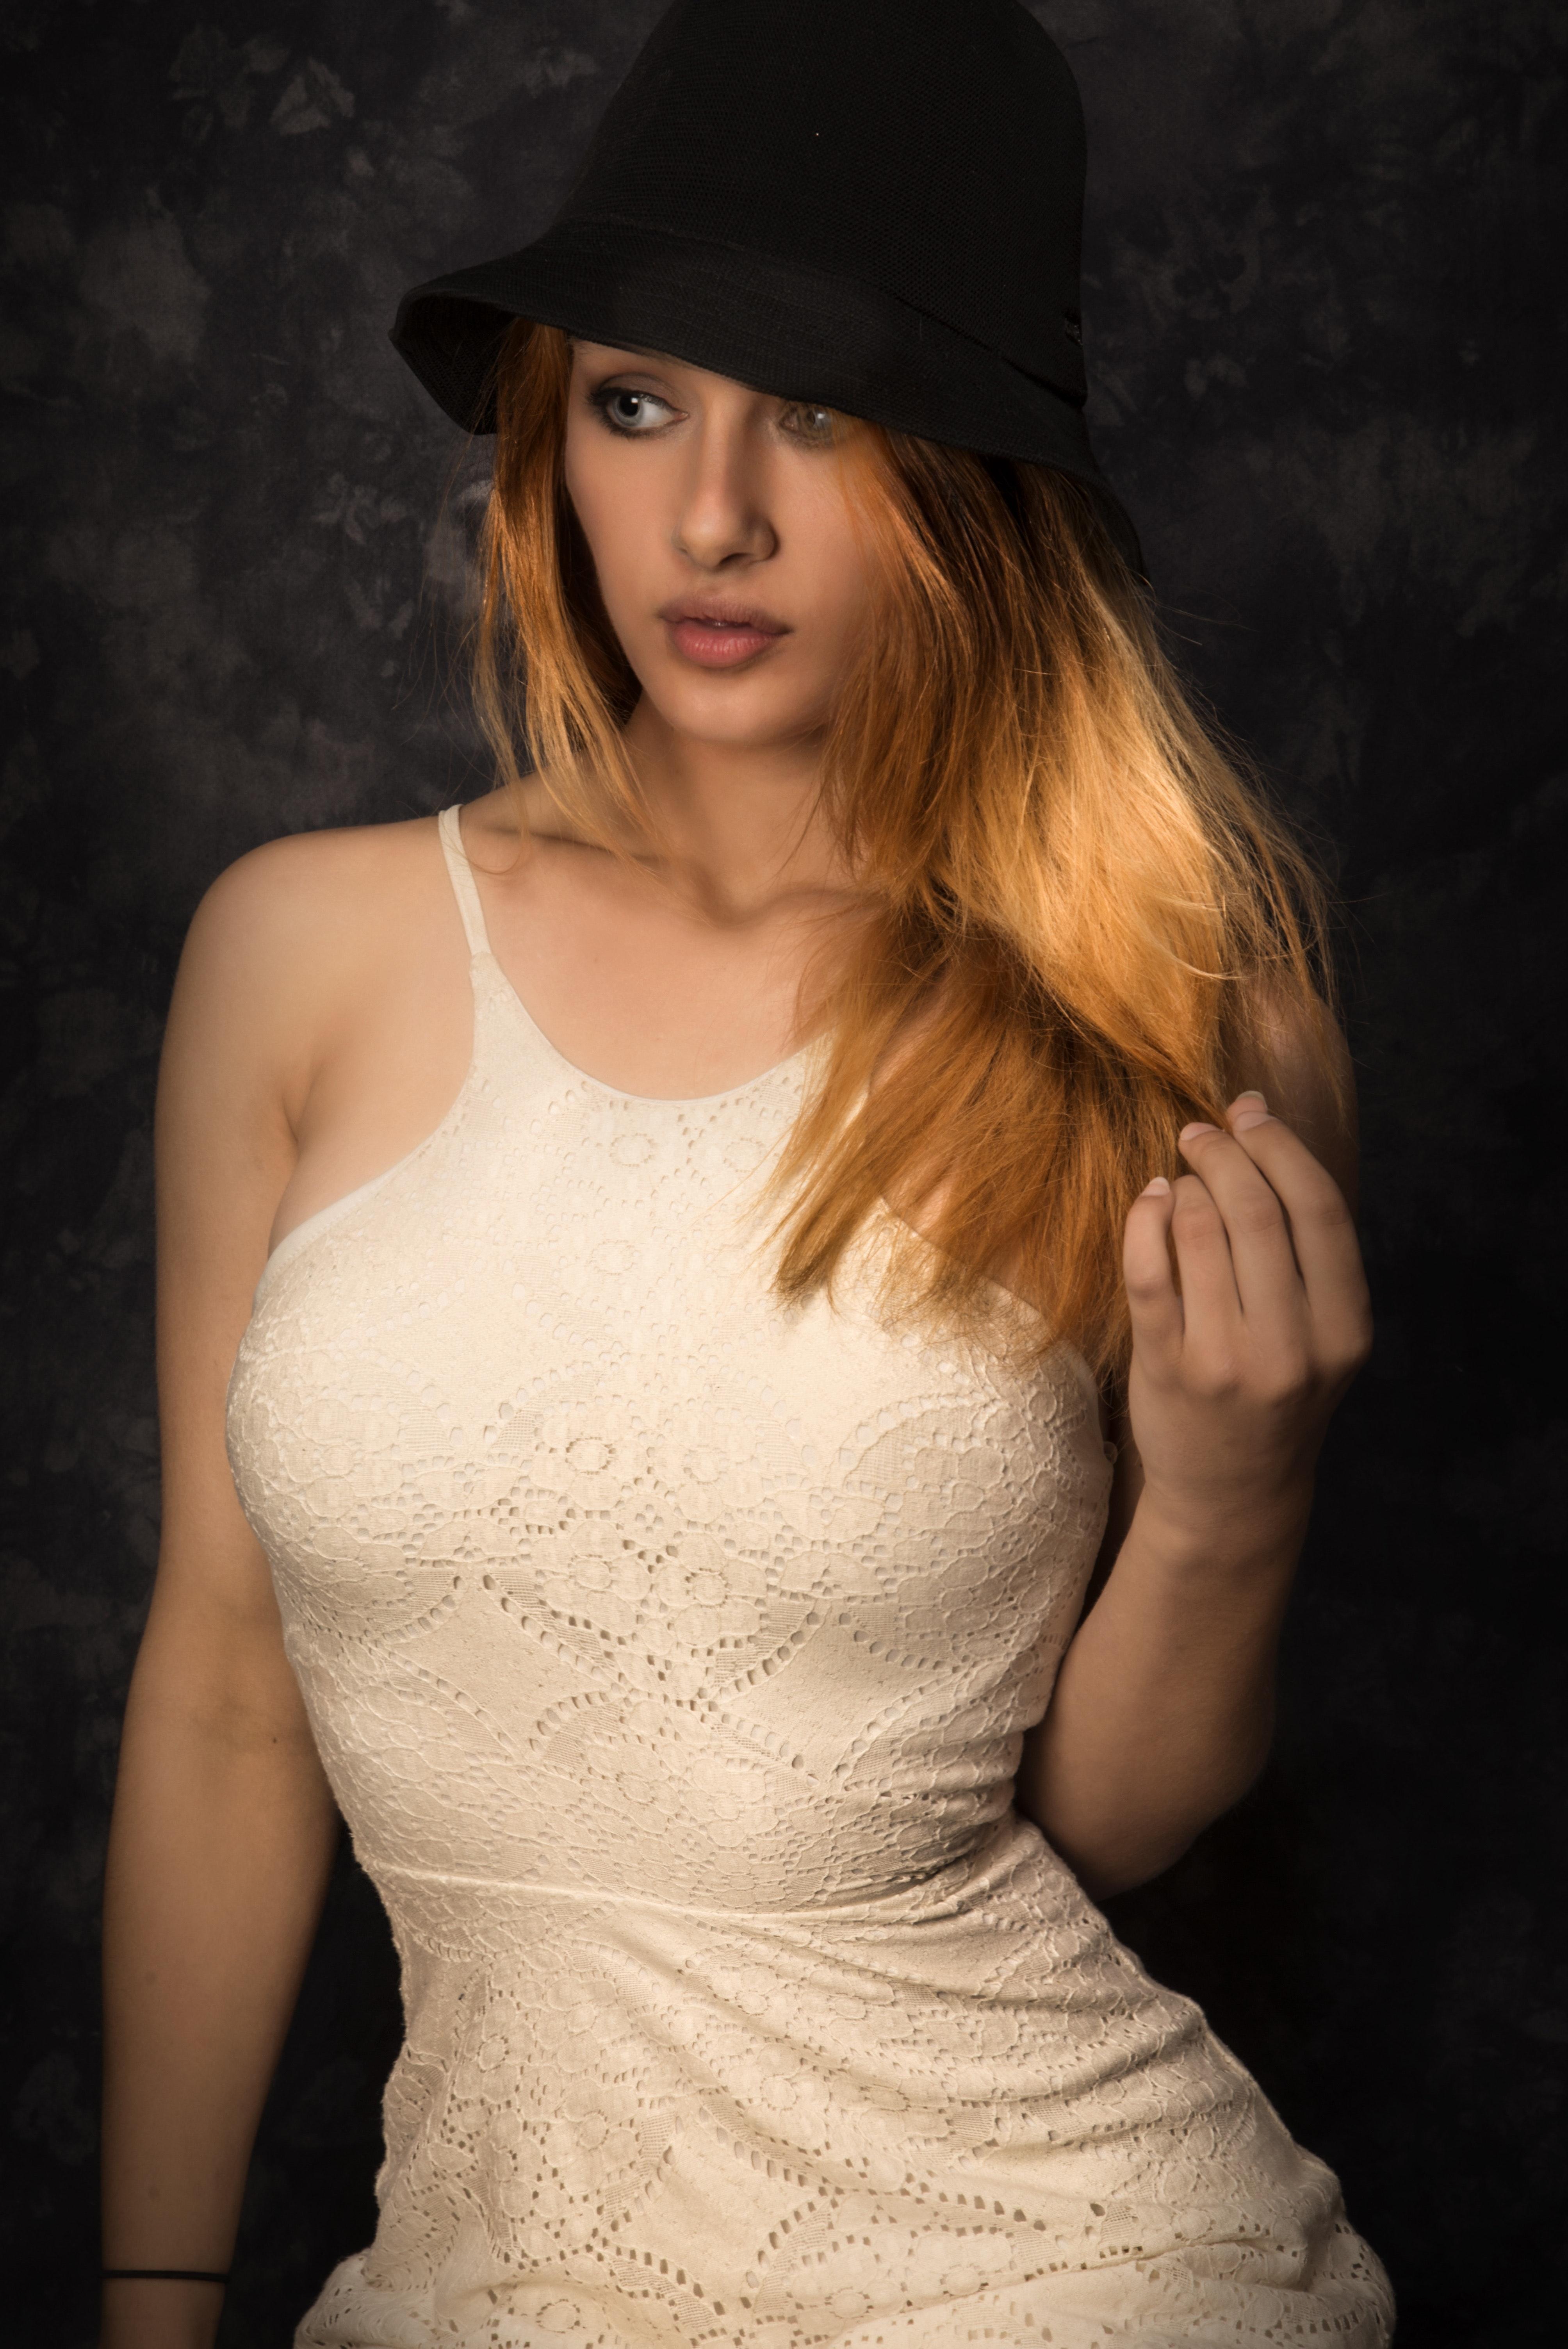 Woman wearing black hat and white sleeveless dress photo